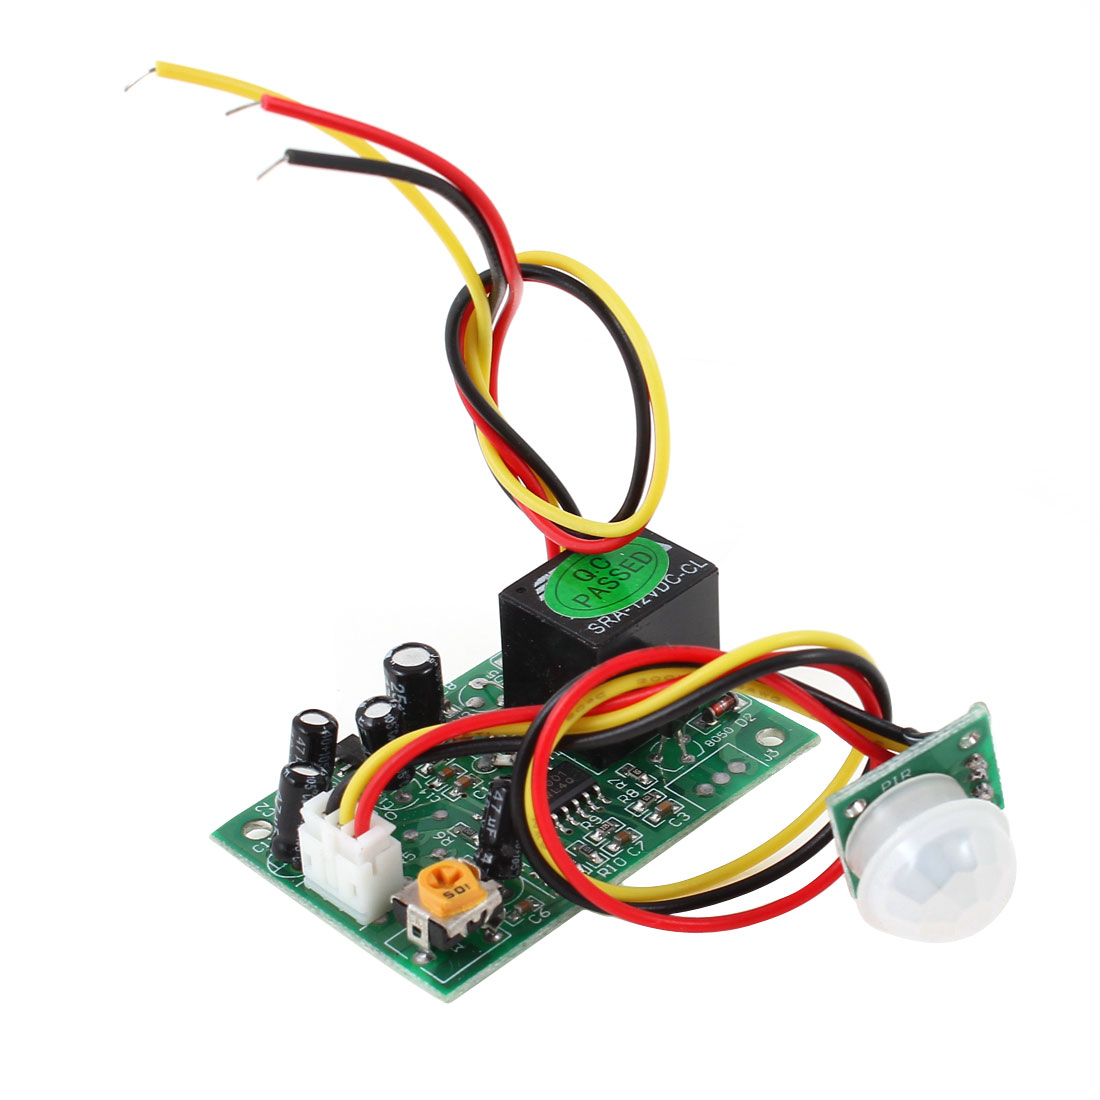 JL-286 Wall Mounting Pyroelectric Infrared Motion Sensor Detector Module